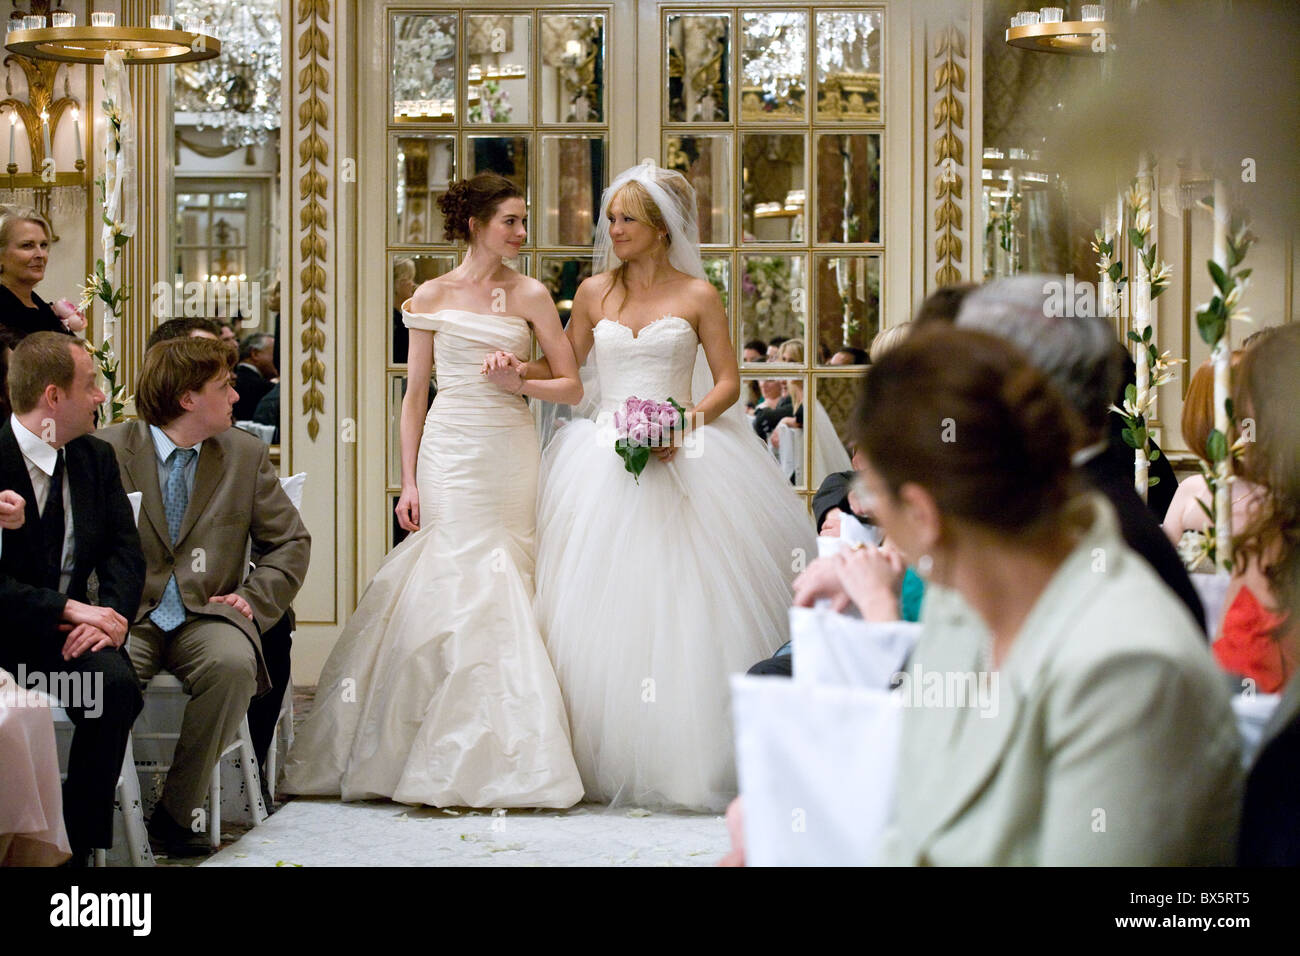 ANNE HATHAWAY & KATE HUDSON BRIDE WARS (2009 Stock Photo: 33319893 ...